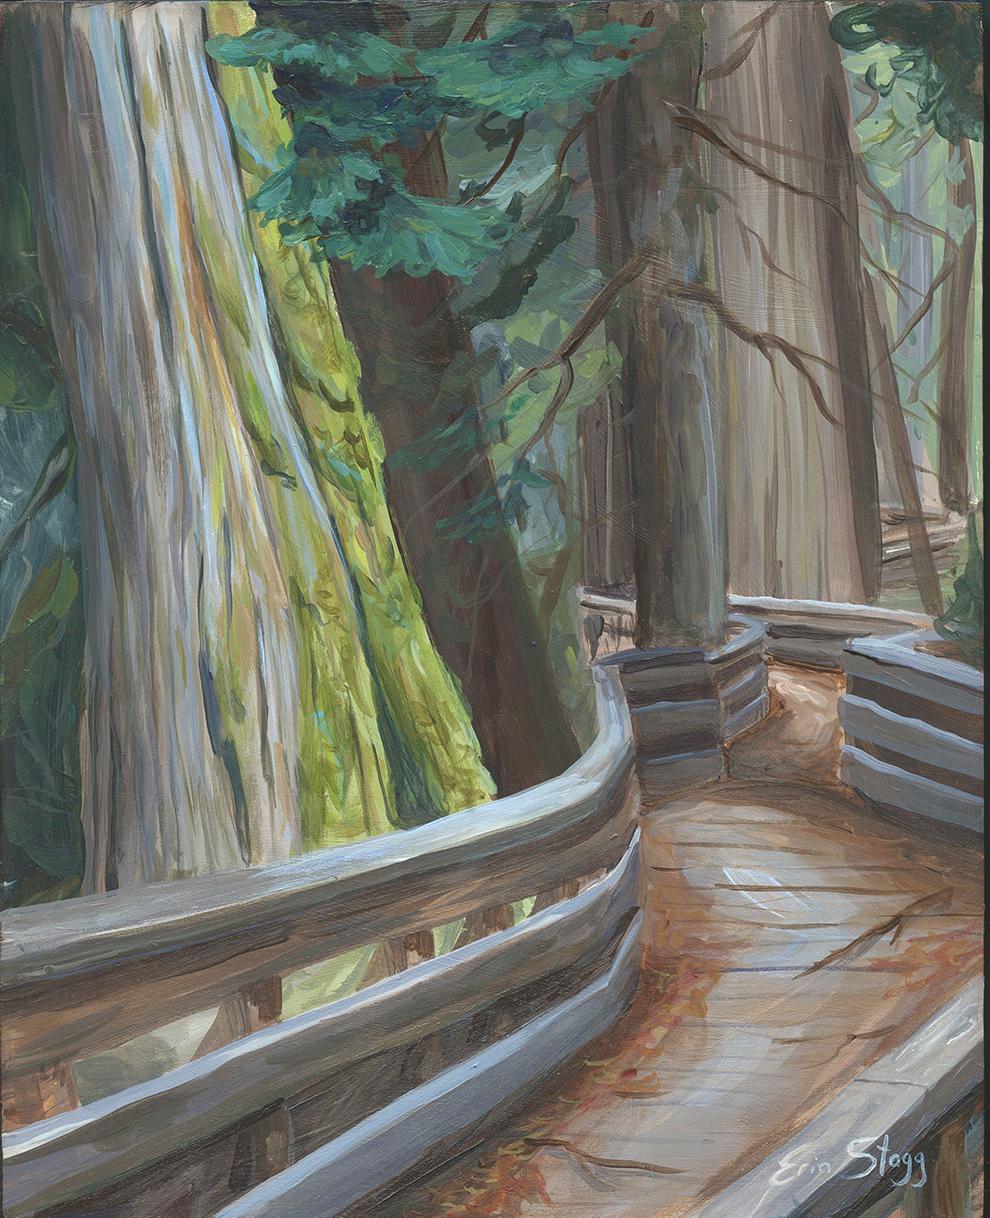 Winding Through the Woods - sm.jpg